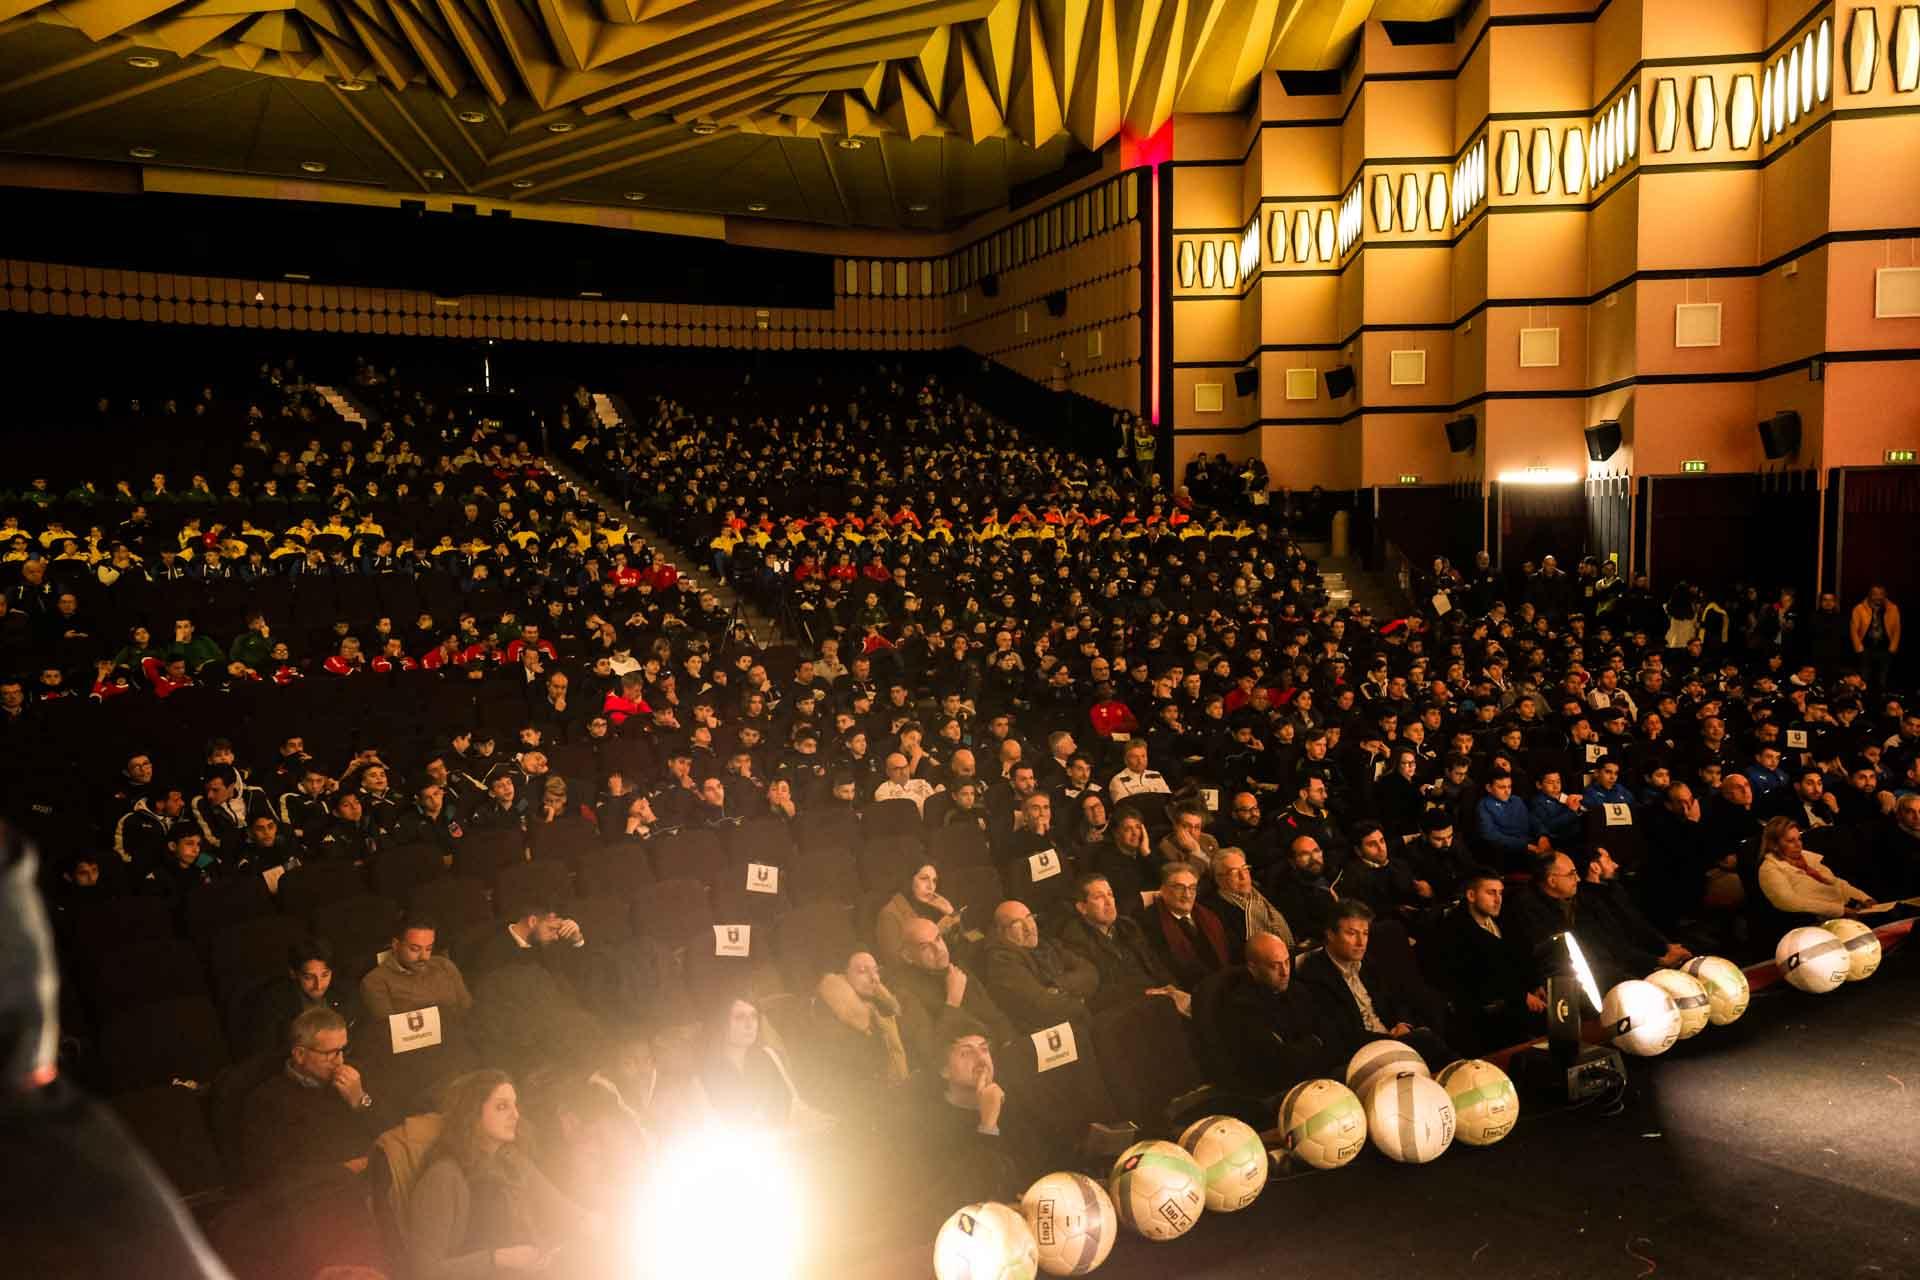 xvii-tch-u14-oggi-inaugurazione-al-teatro-italia